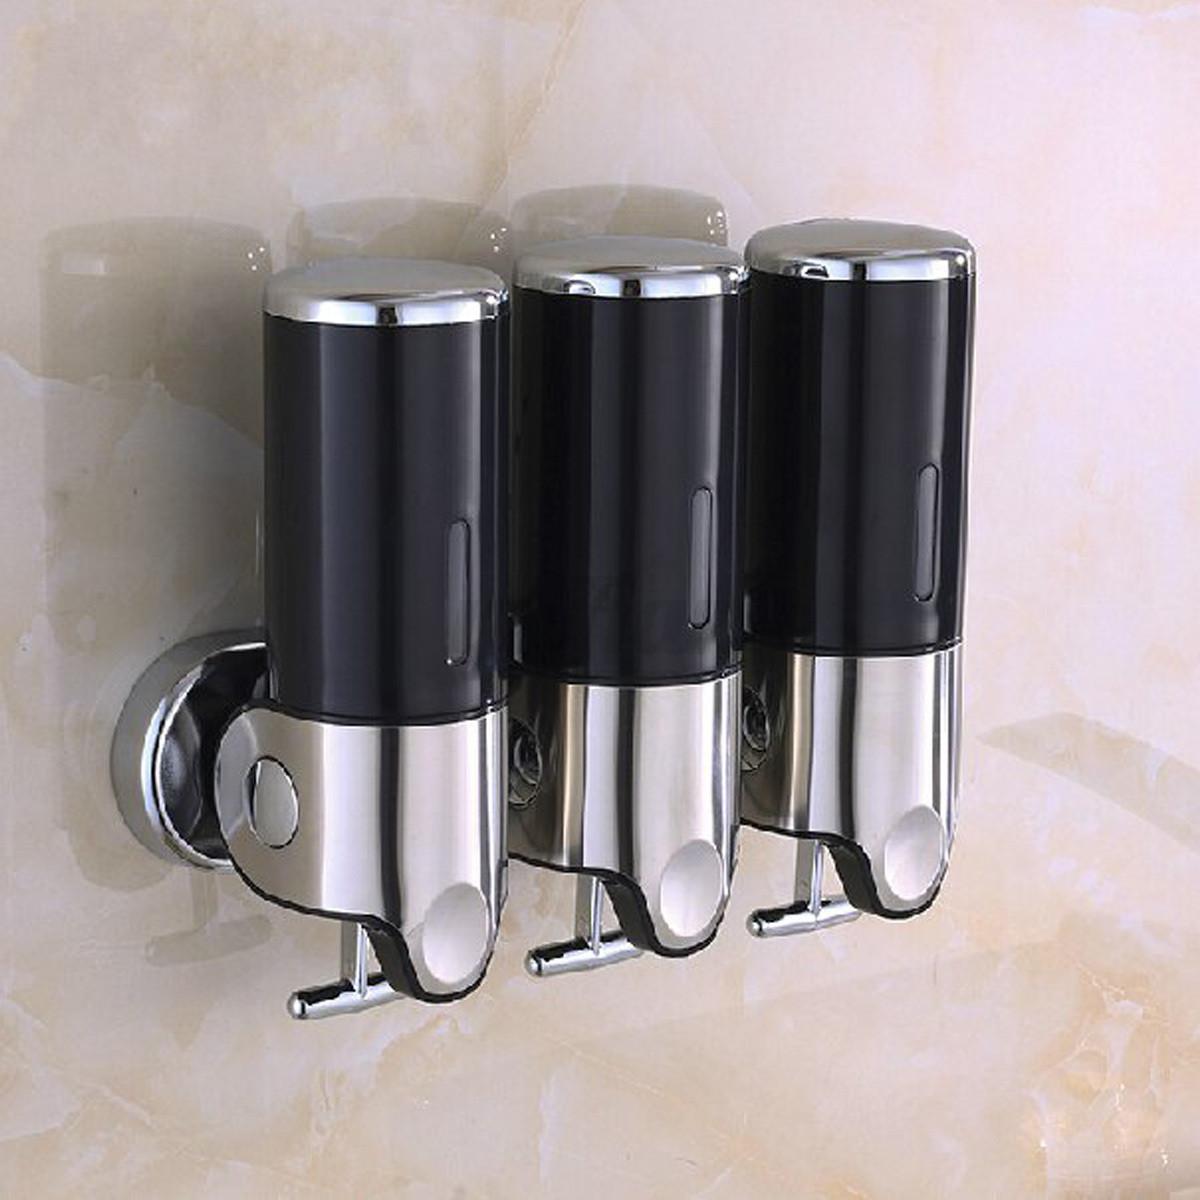 Wall Mounted Bathroom Soap Dispenser  Wall Mounted Soap Dispenser Toilet Bathroom Shampoo Liquid